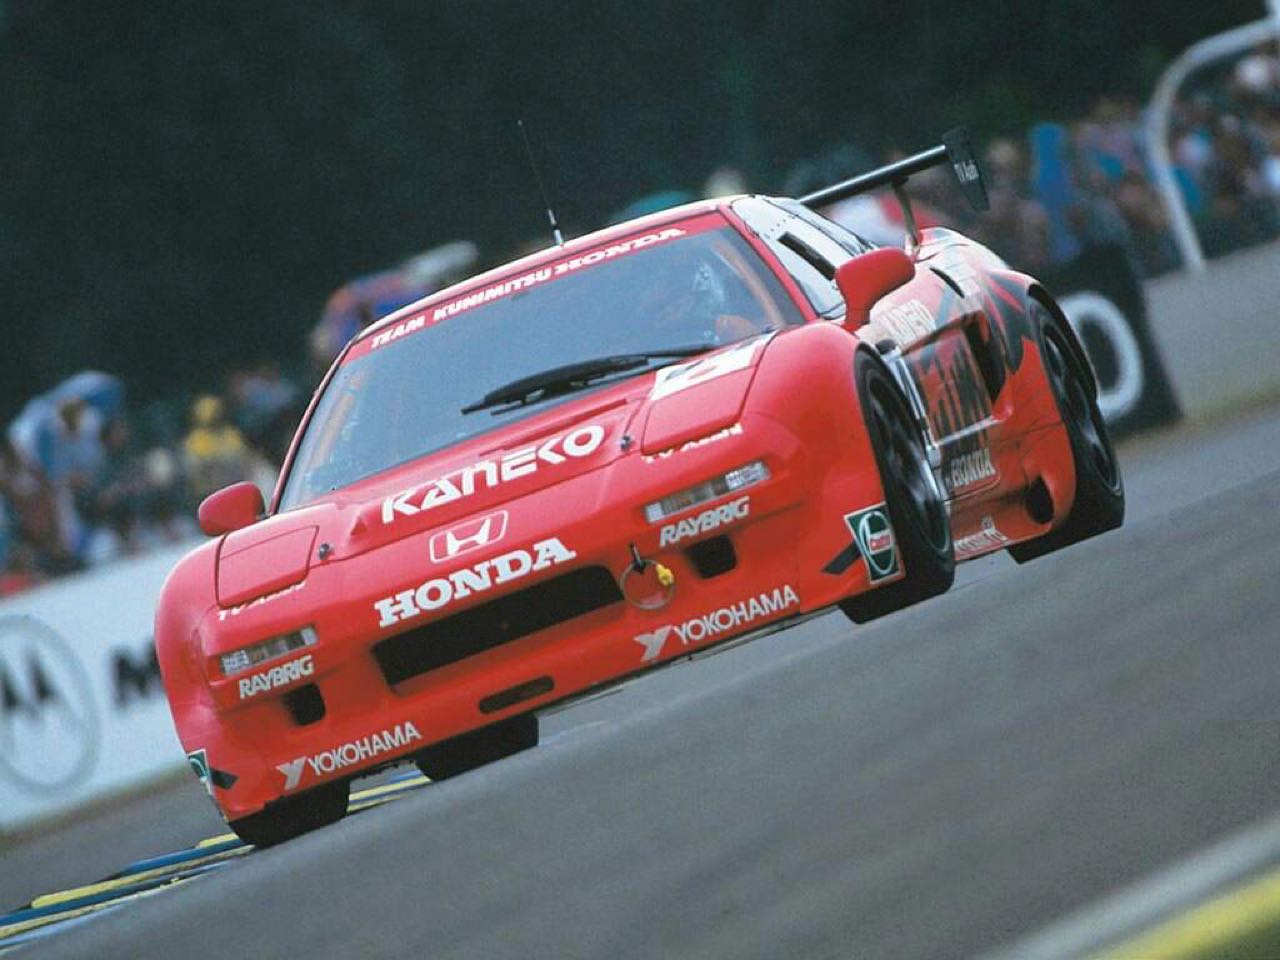 #Petrolhead - Keiichi Tsuchiya - Le Maître du drift ! 8